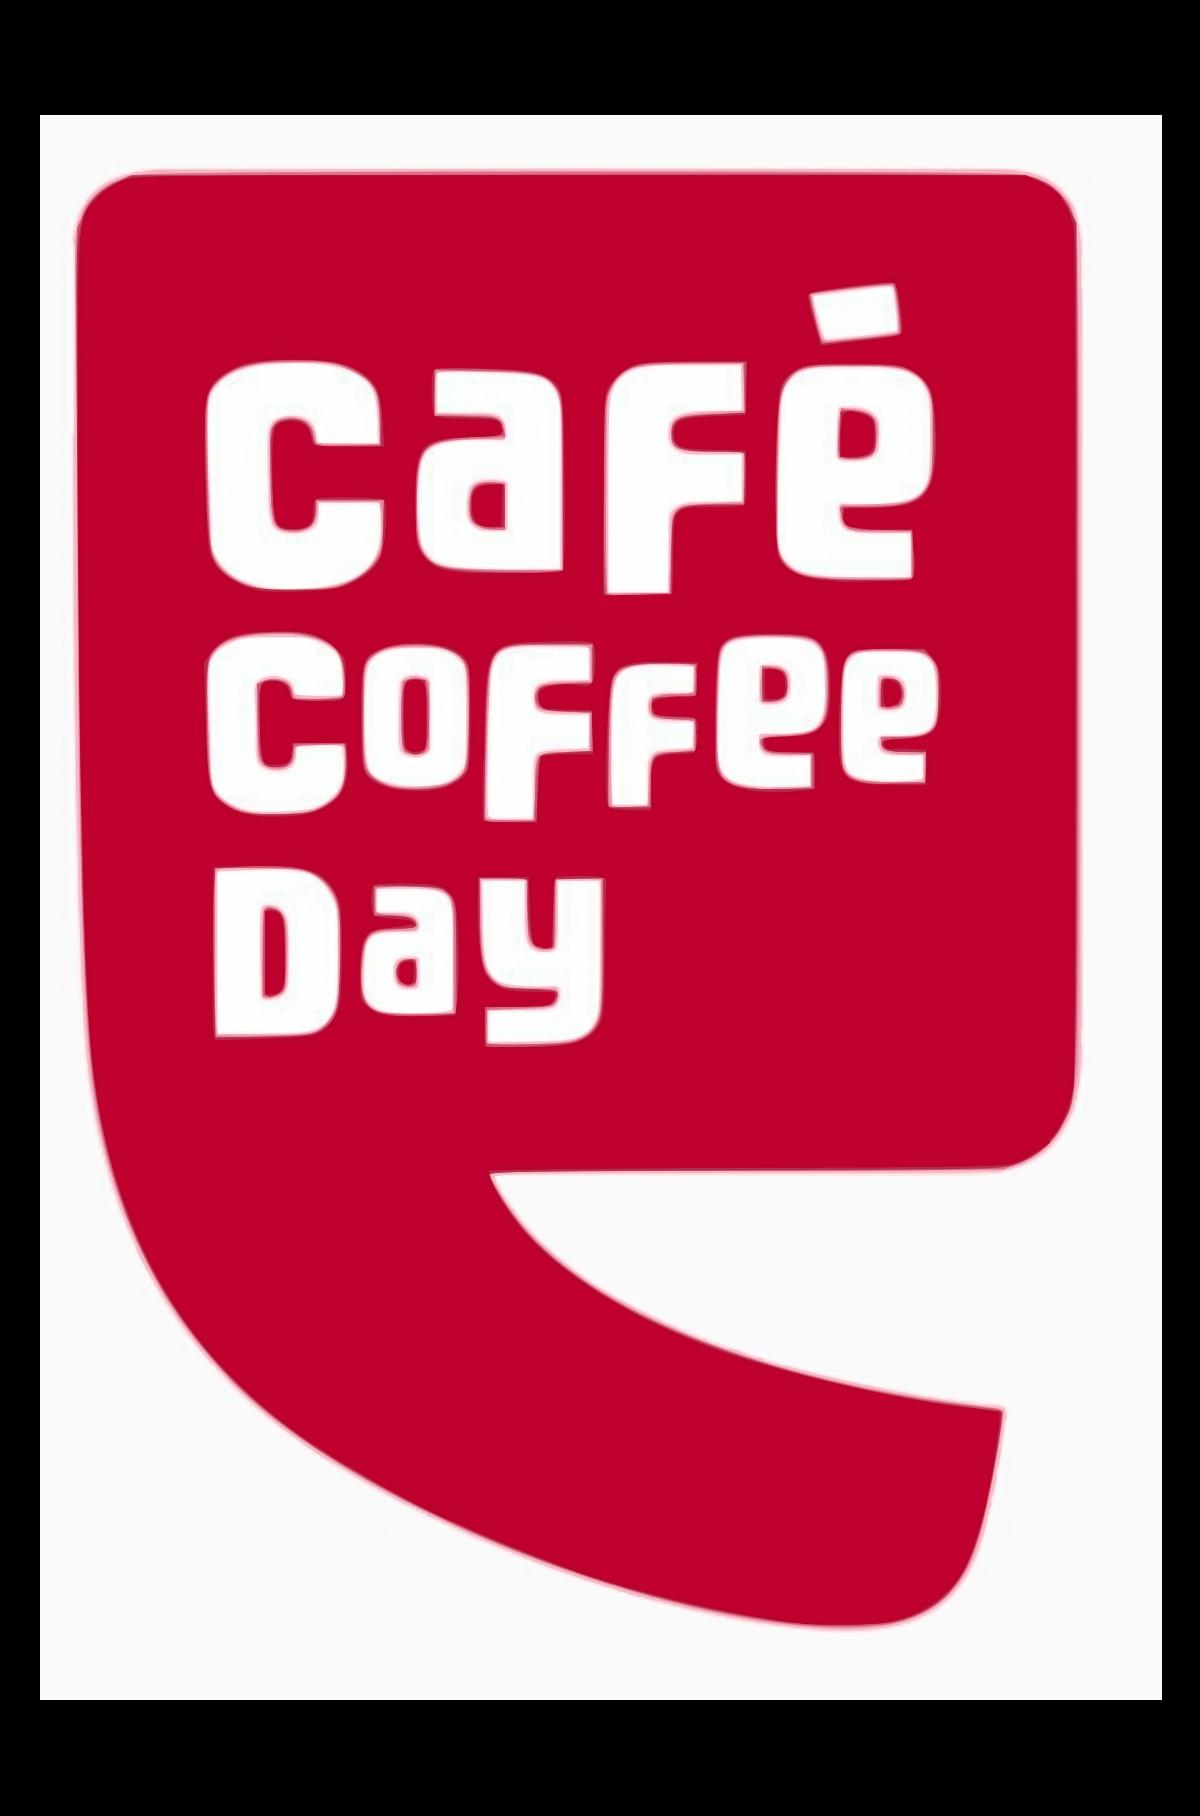 Cafe Coffee Day - Phoenix Market City - Mahadevapura - Bangalore Image